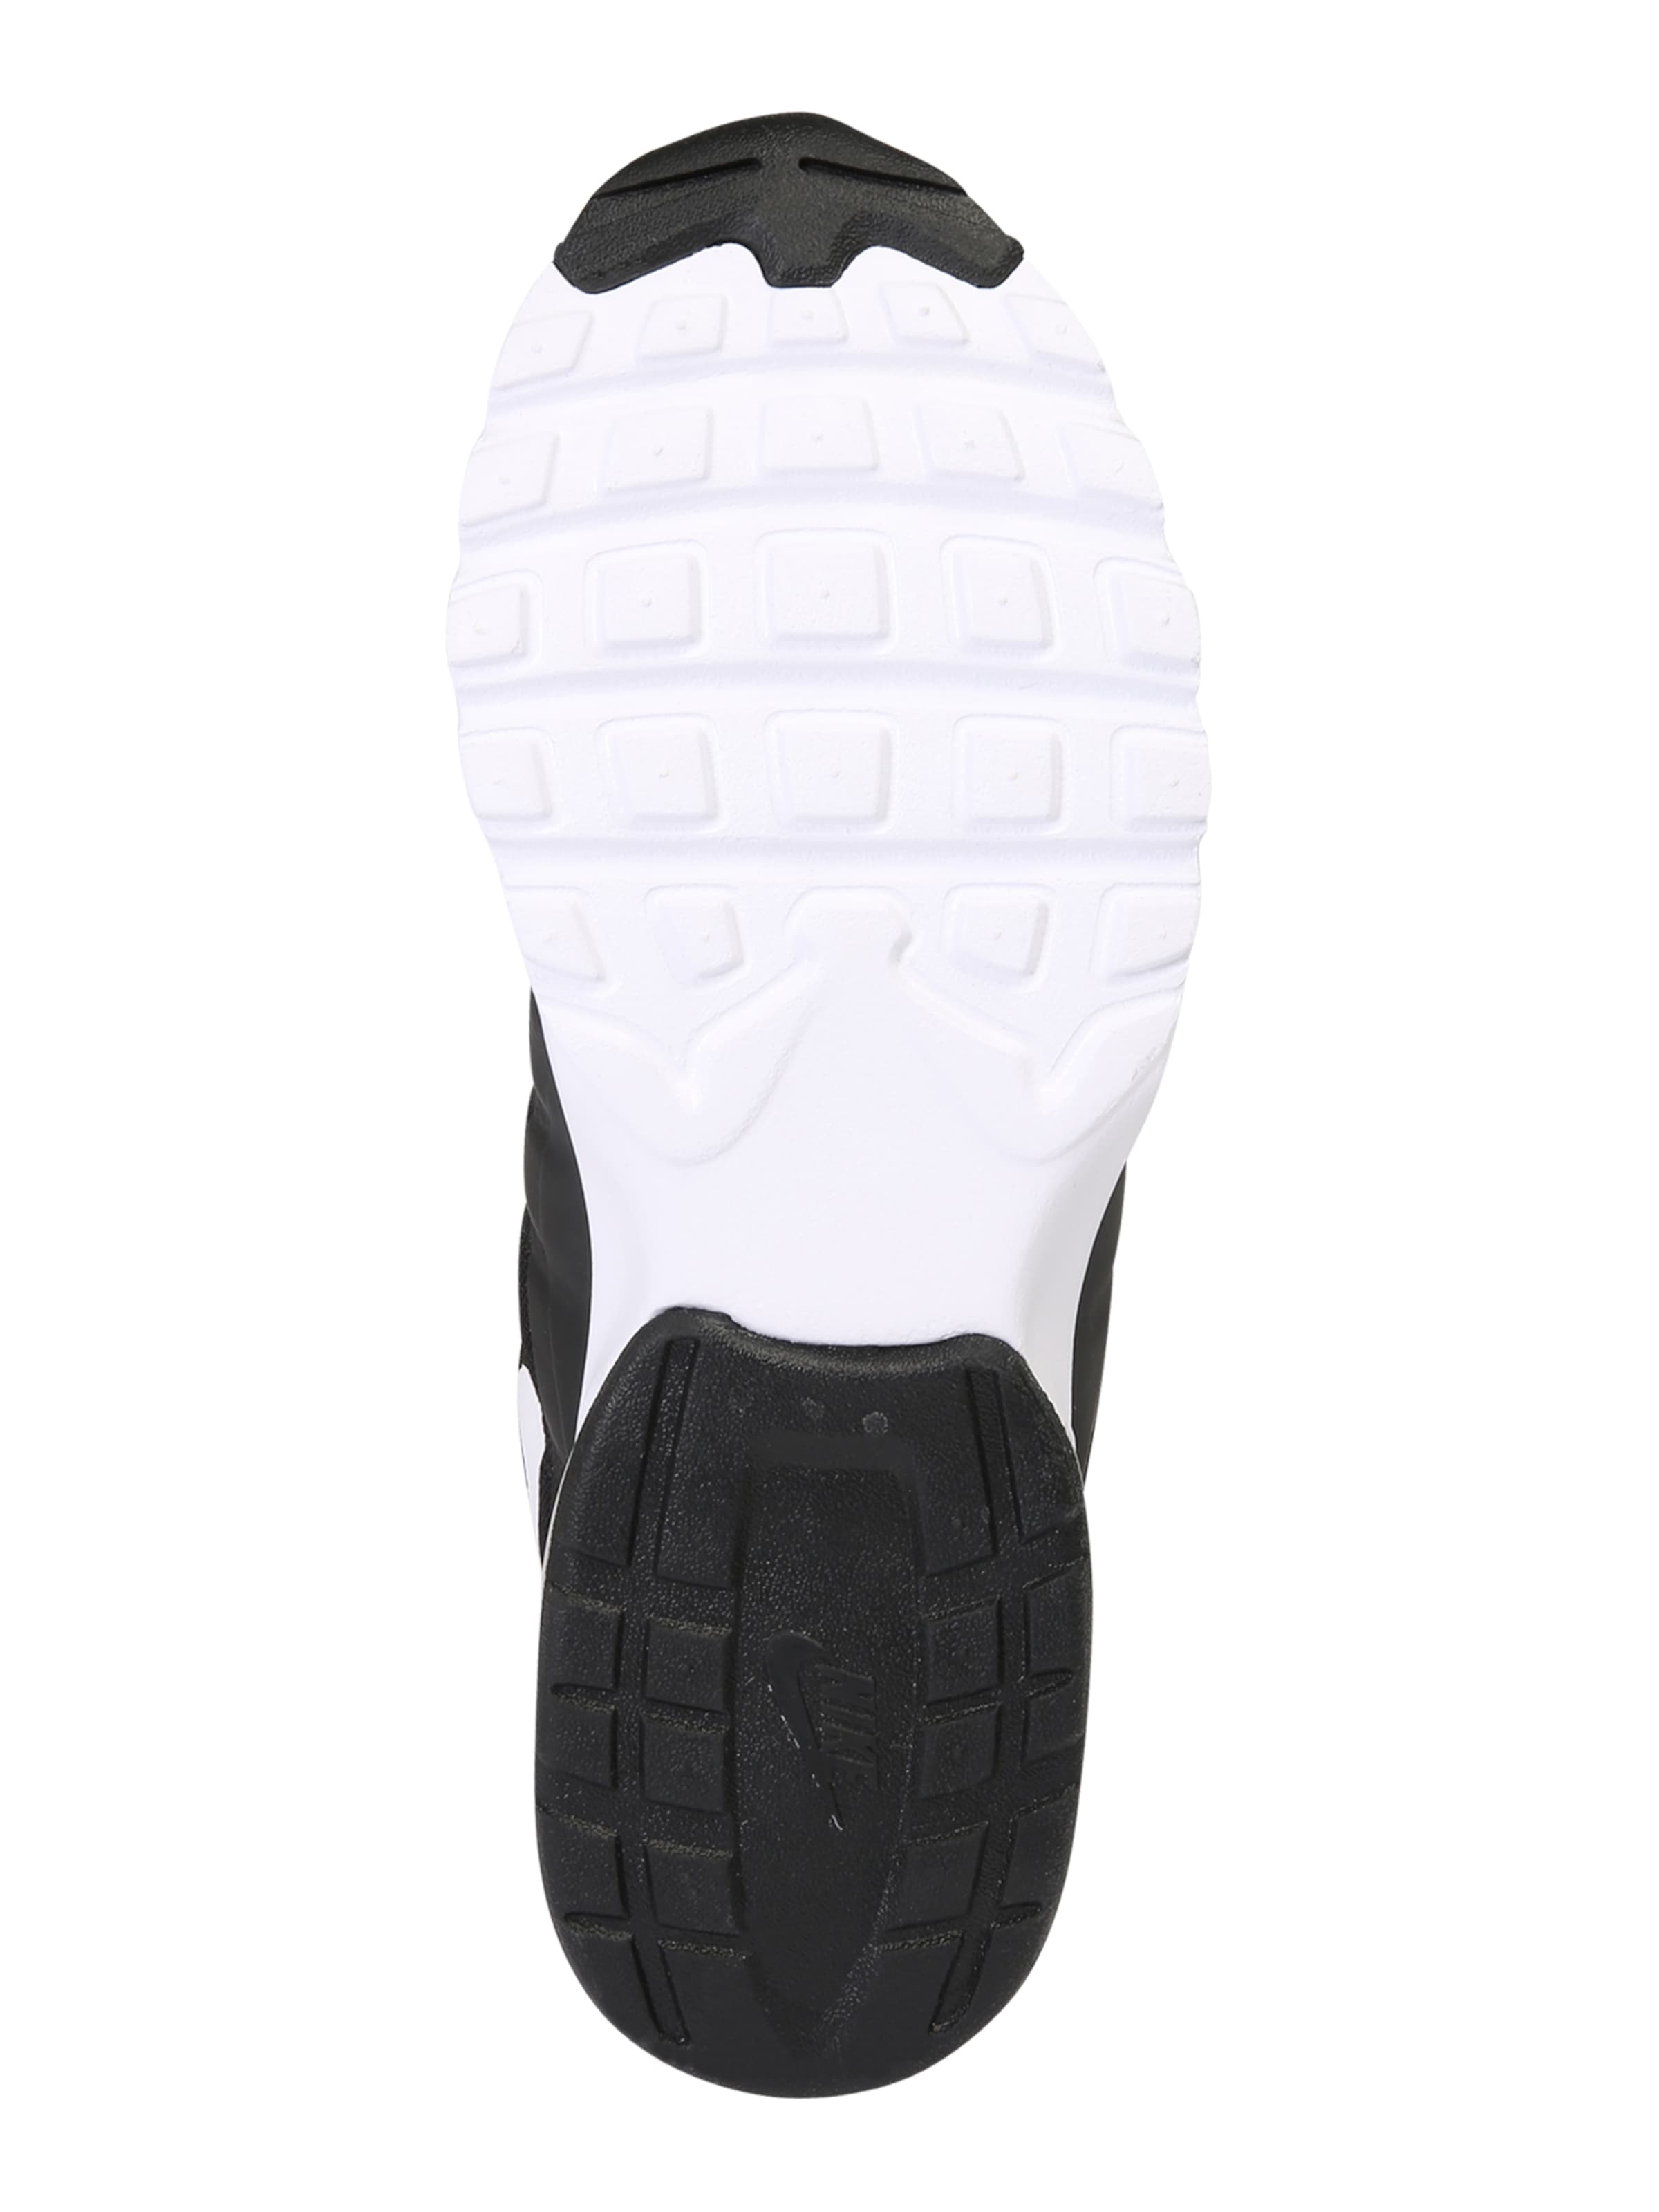 'air Max In Invigor' SchwarzWeiß Nike Sneaker Sportswear rdsxhQtC